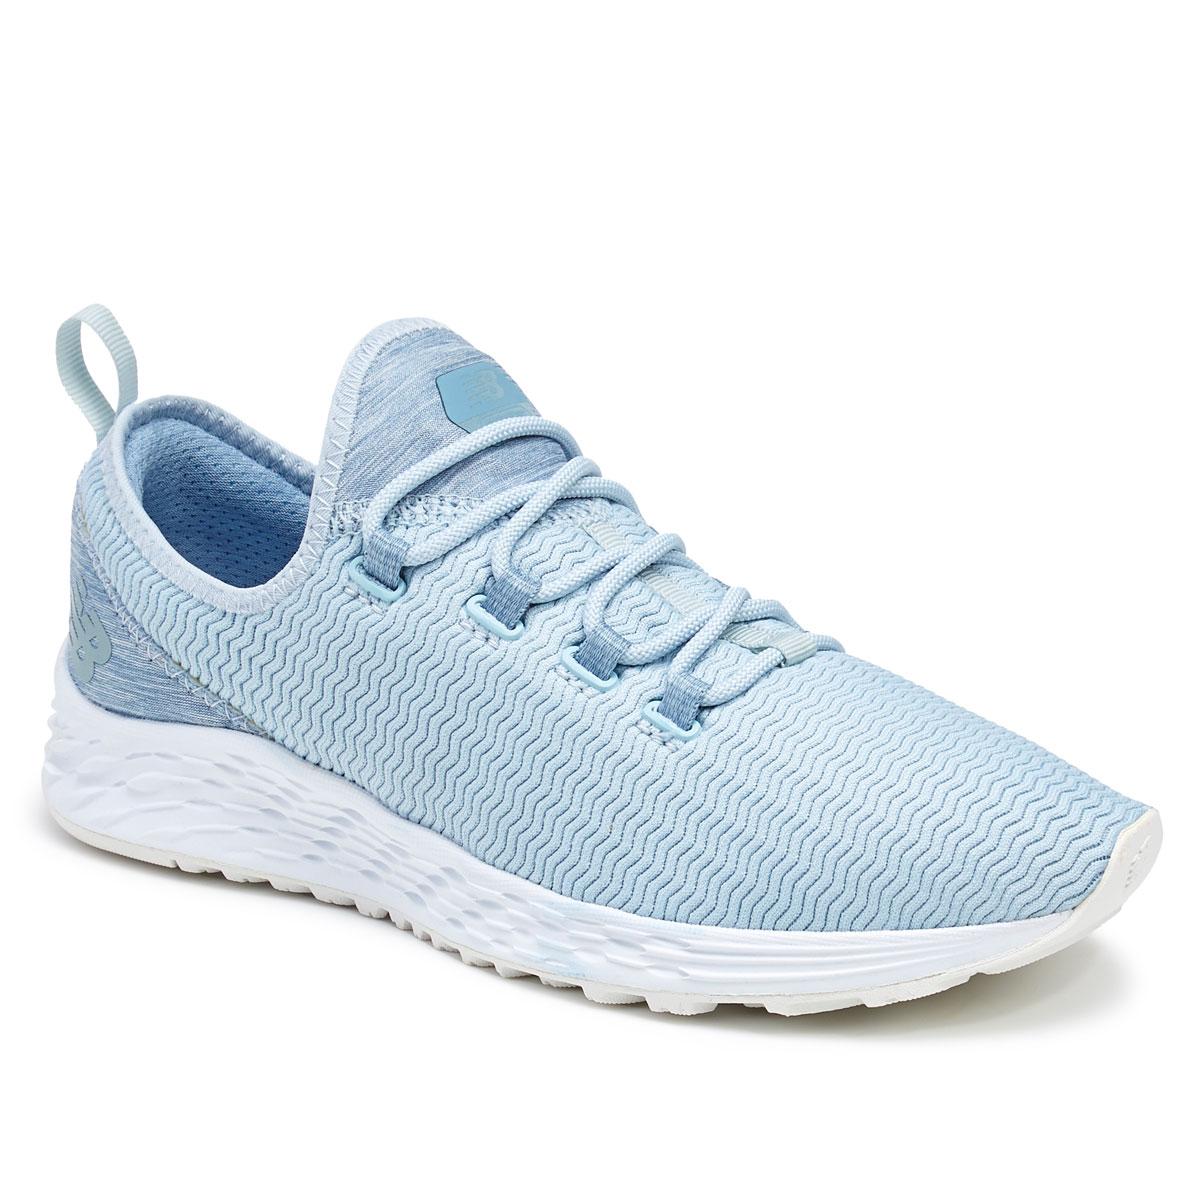 New Balance Women's Fresh Foam Arishi Sport V1 Running Shoes - Blue, 6.5